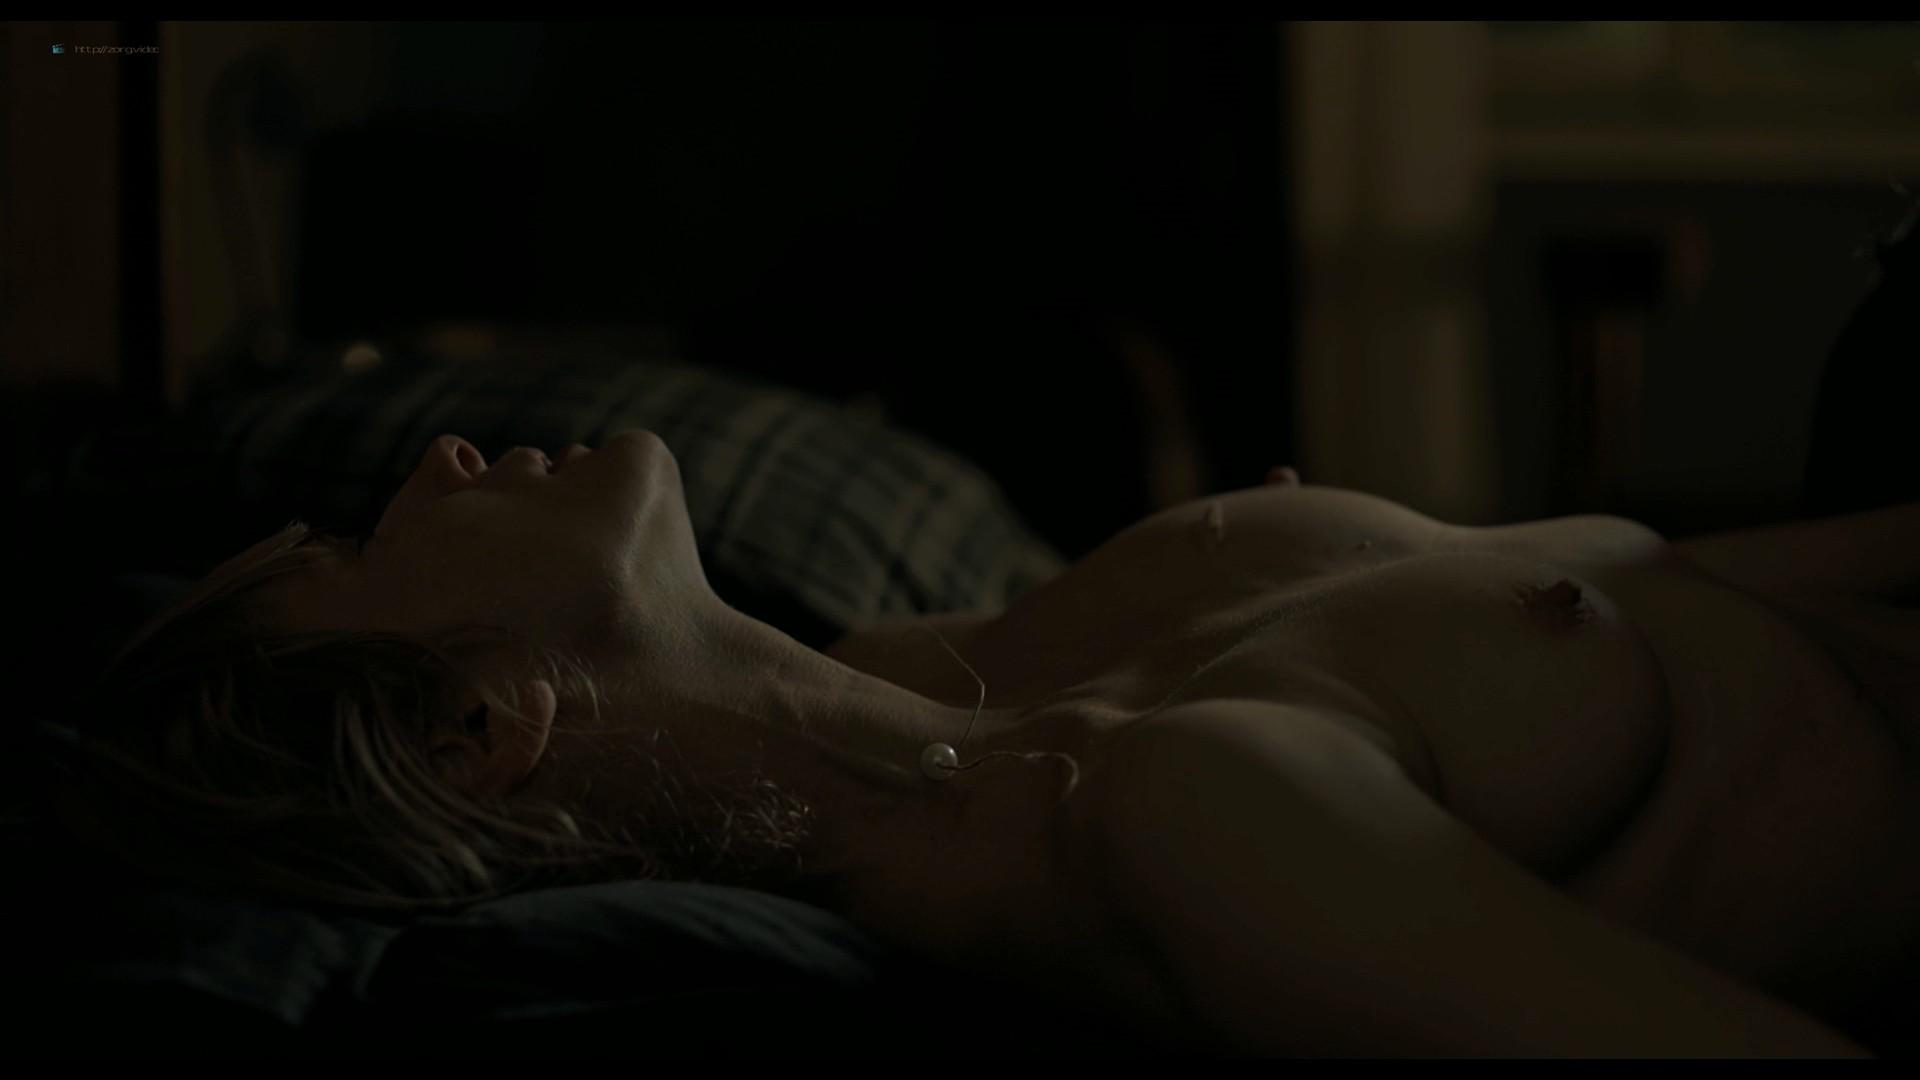 Magdalena Cielecka nude sex Roma Gasiorowska nude too - Dark, Almost Night (PL-2019) HD 1080p BluRay (4)